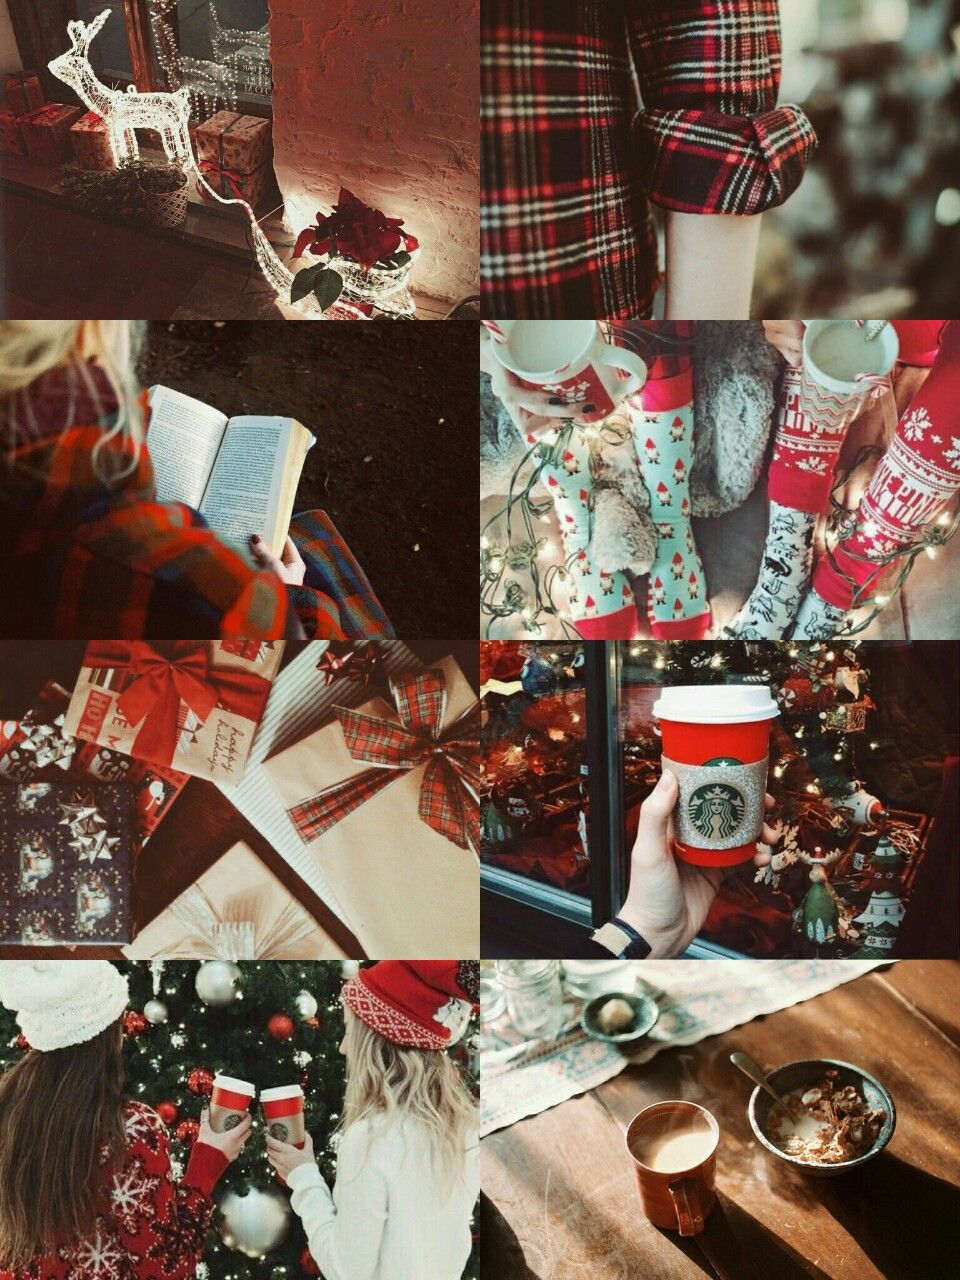 Aesthetic Holiday Holiday Season Aesthetic Most Wonderful Time Pinterest